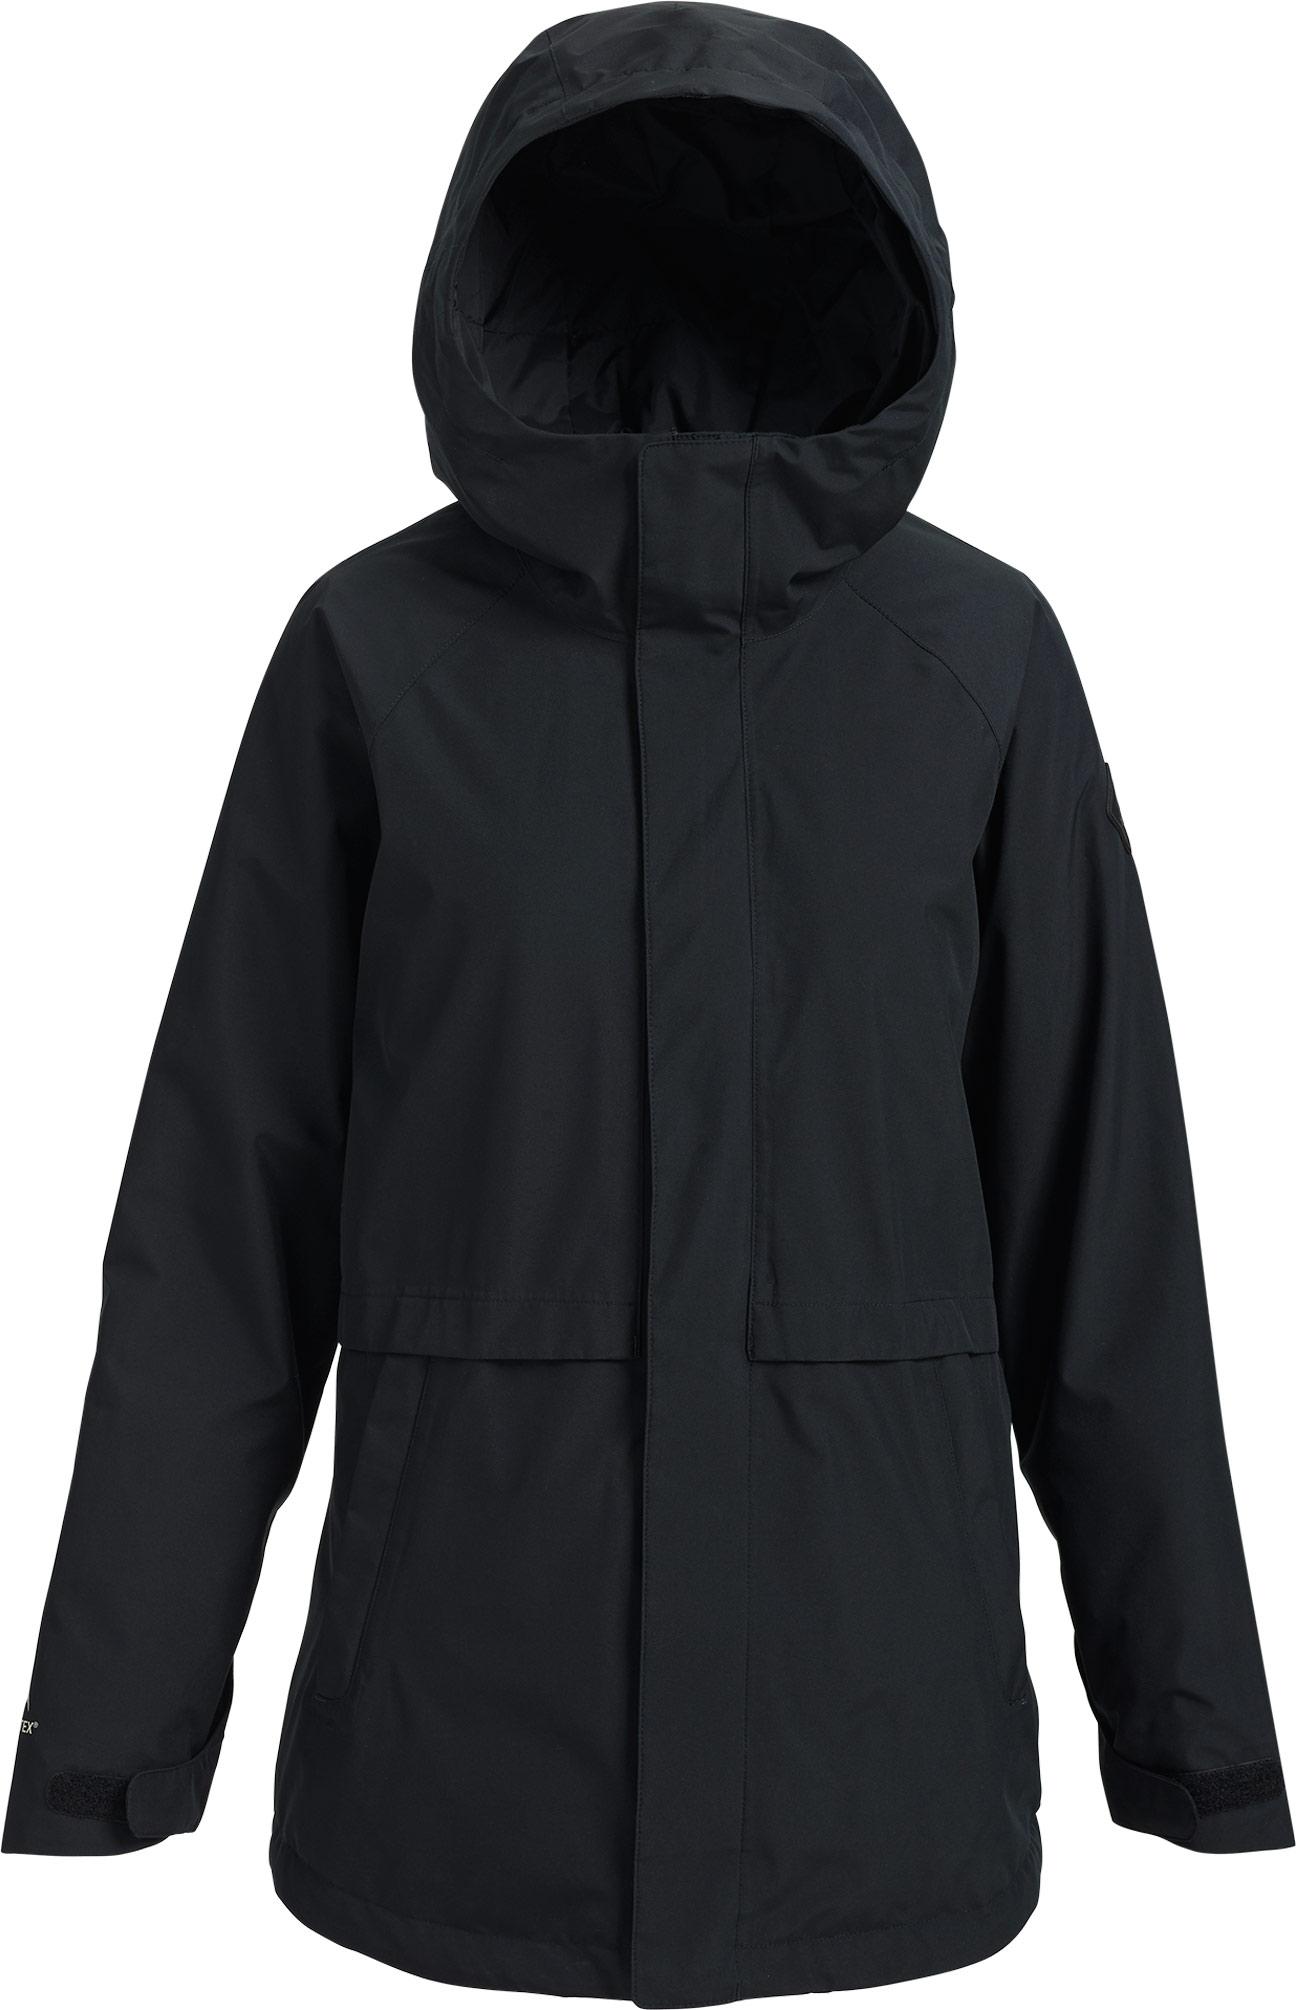 2f441e38a1 Burton Gore-Tex Kaylo Snowboard Jacket